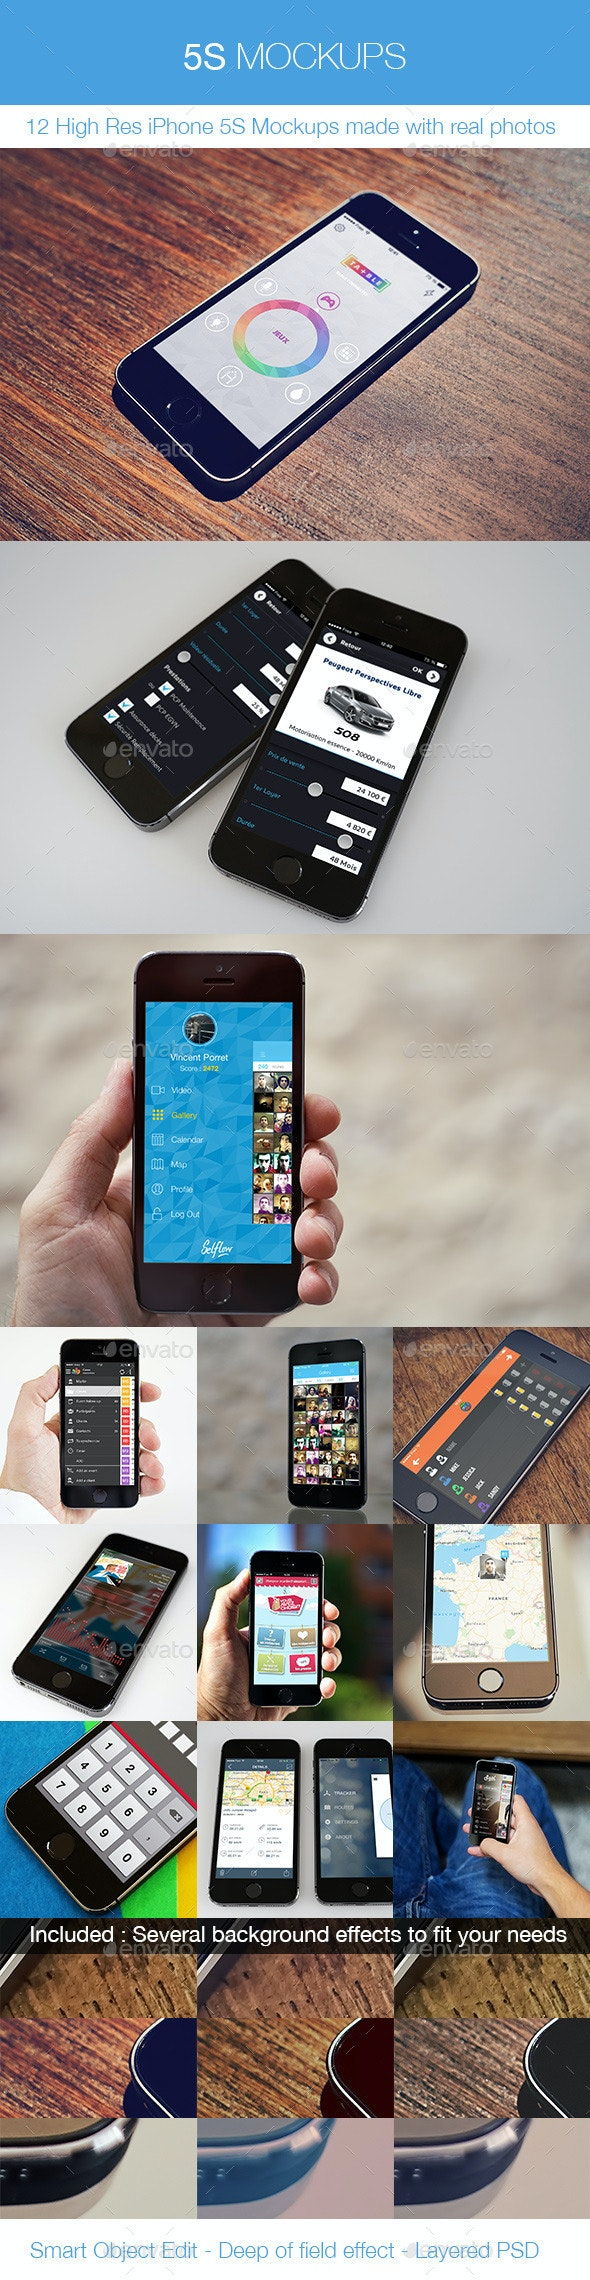 5S Mockups - 12 iPhone 5S Real Photos Mockups  - Mobile Displays